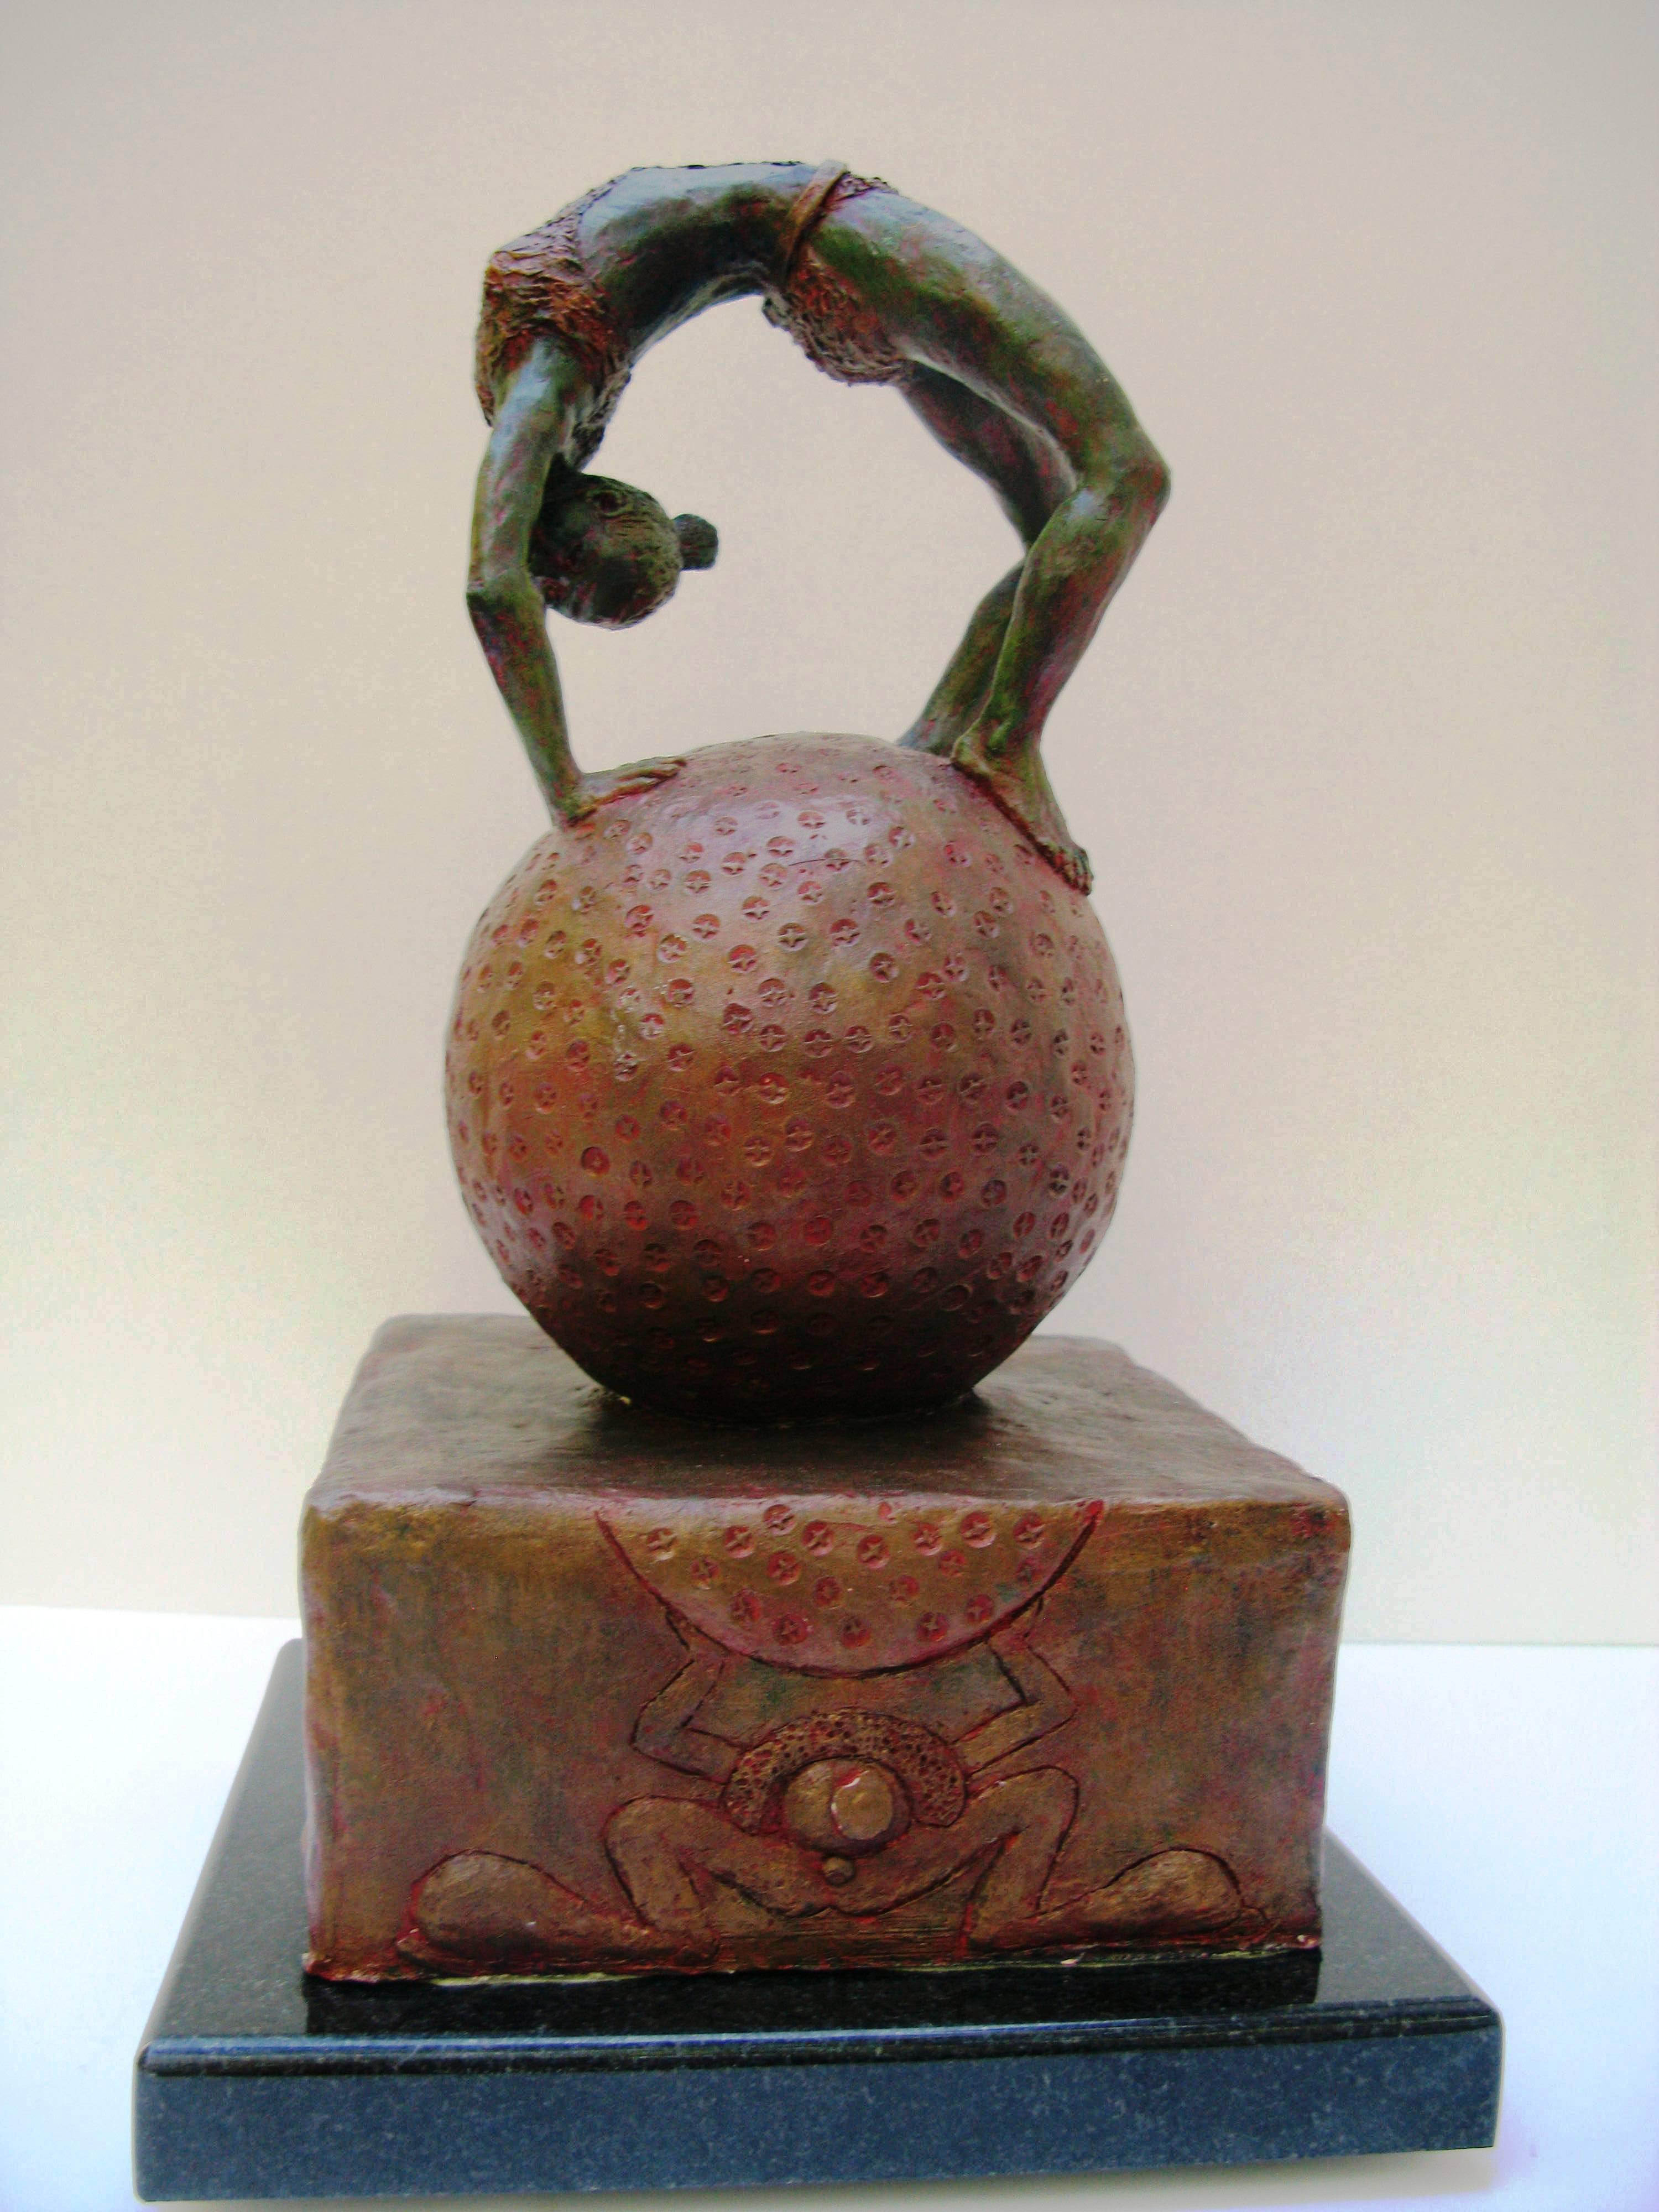 Fay Stevenson-Smith, Circus Acrobat, terracotta